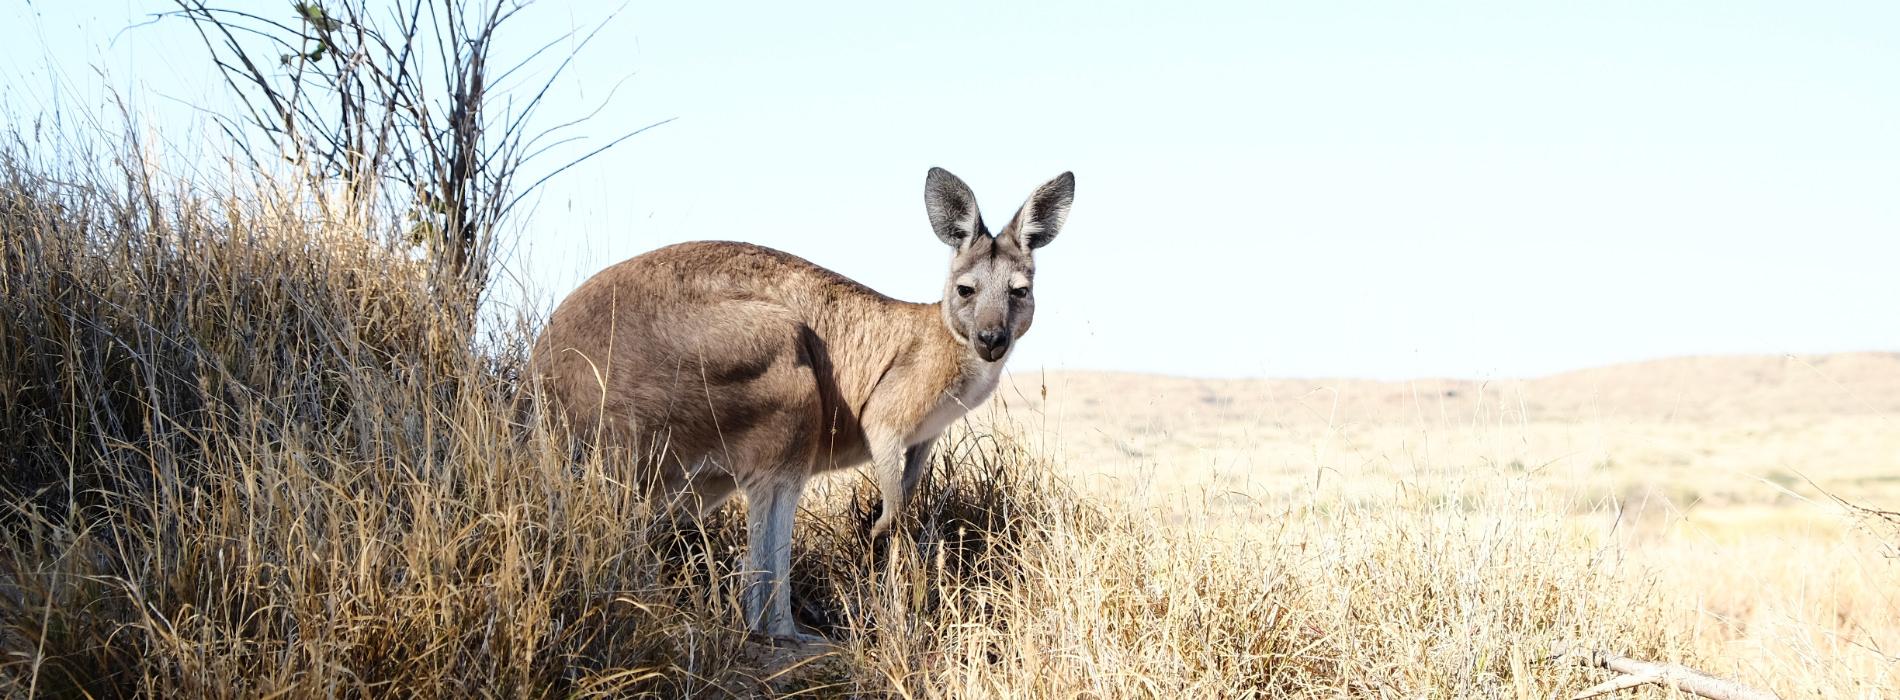 Western Gray Kangaroo